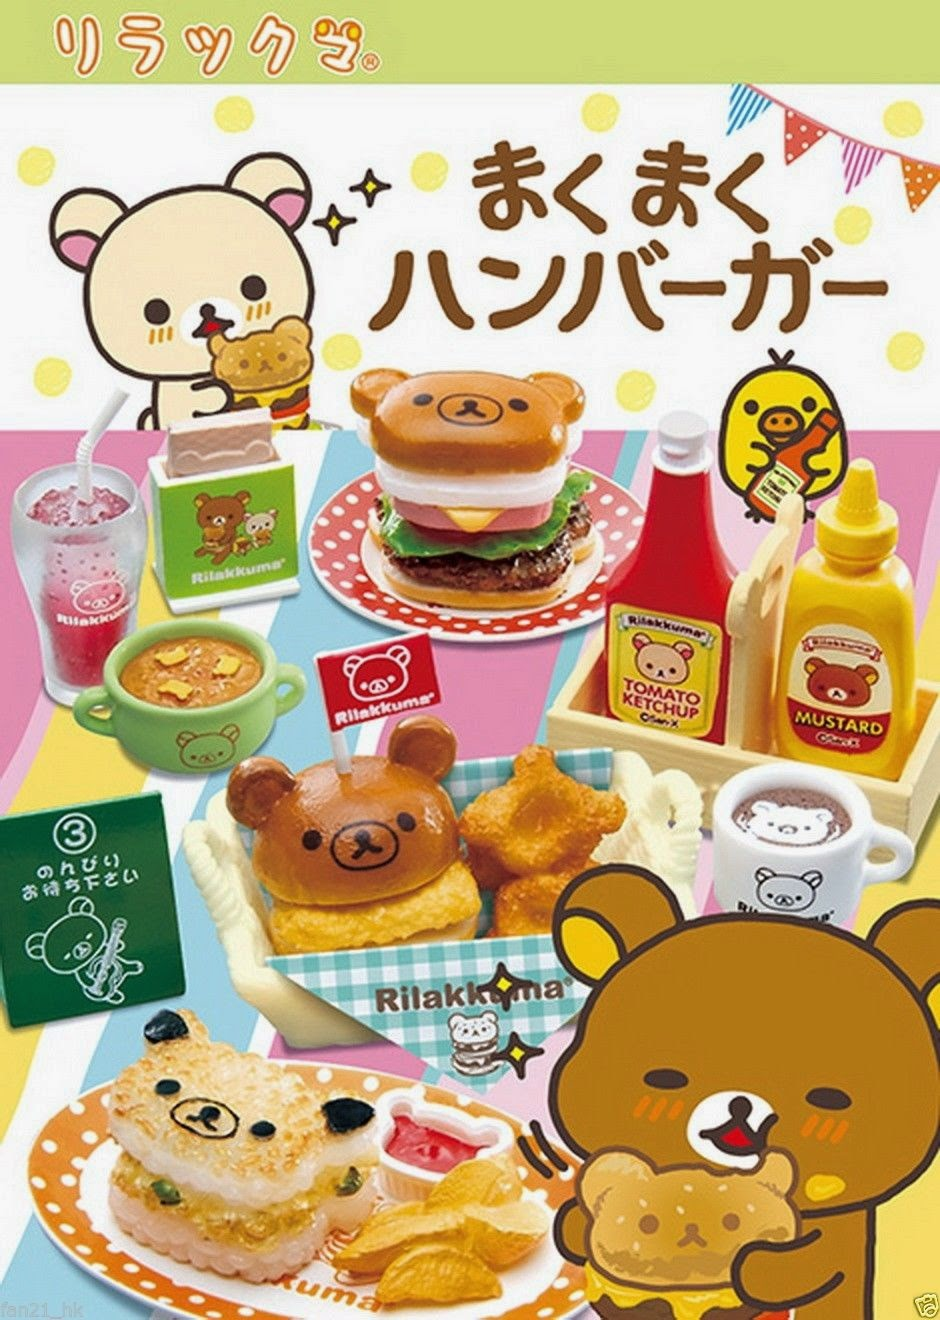 Burger Re-ment San-x Rilakkuma miniature Maku Maku Hamburger Full set of 8